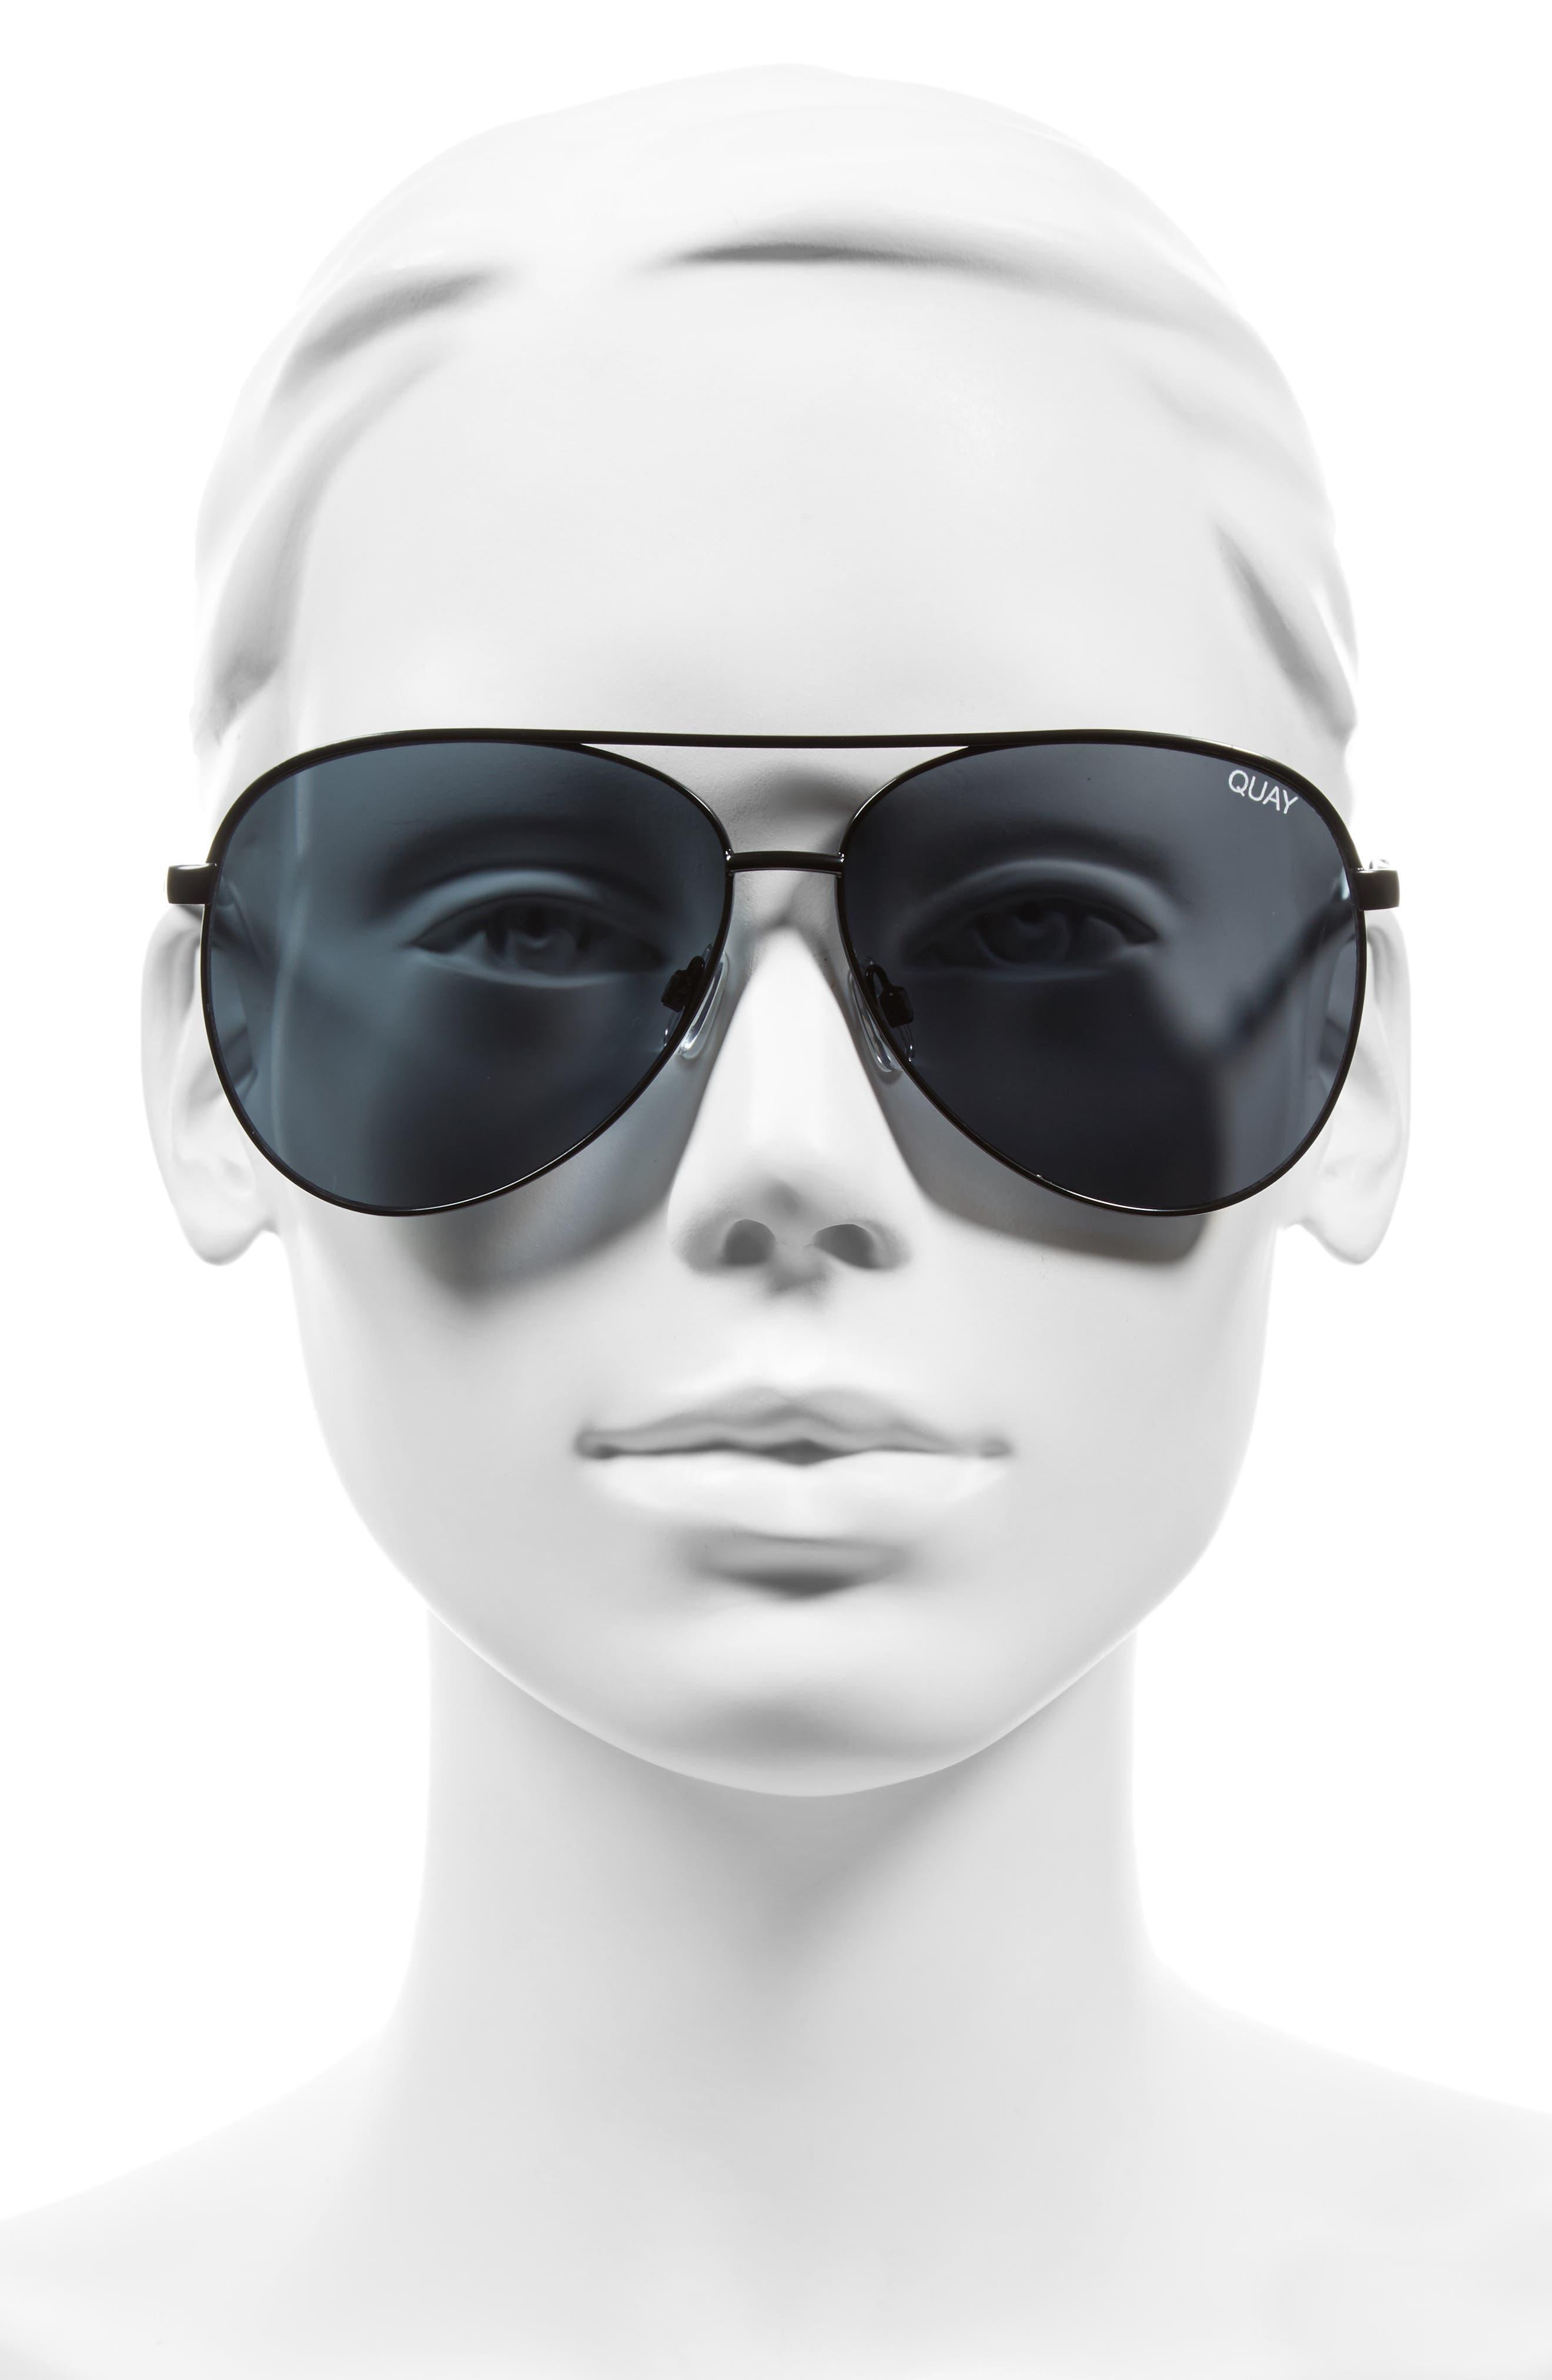 Vivienne 64mm Aviator Sunglasses,                             Alternate thumbnail 2, color,                             BLACK/ SMOKE